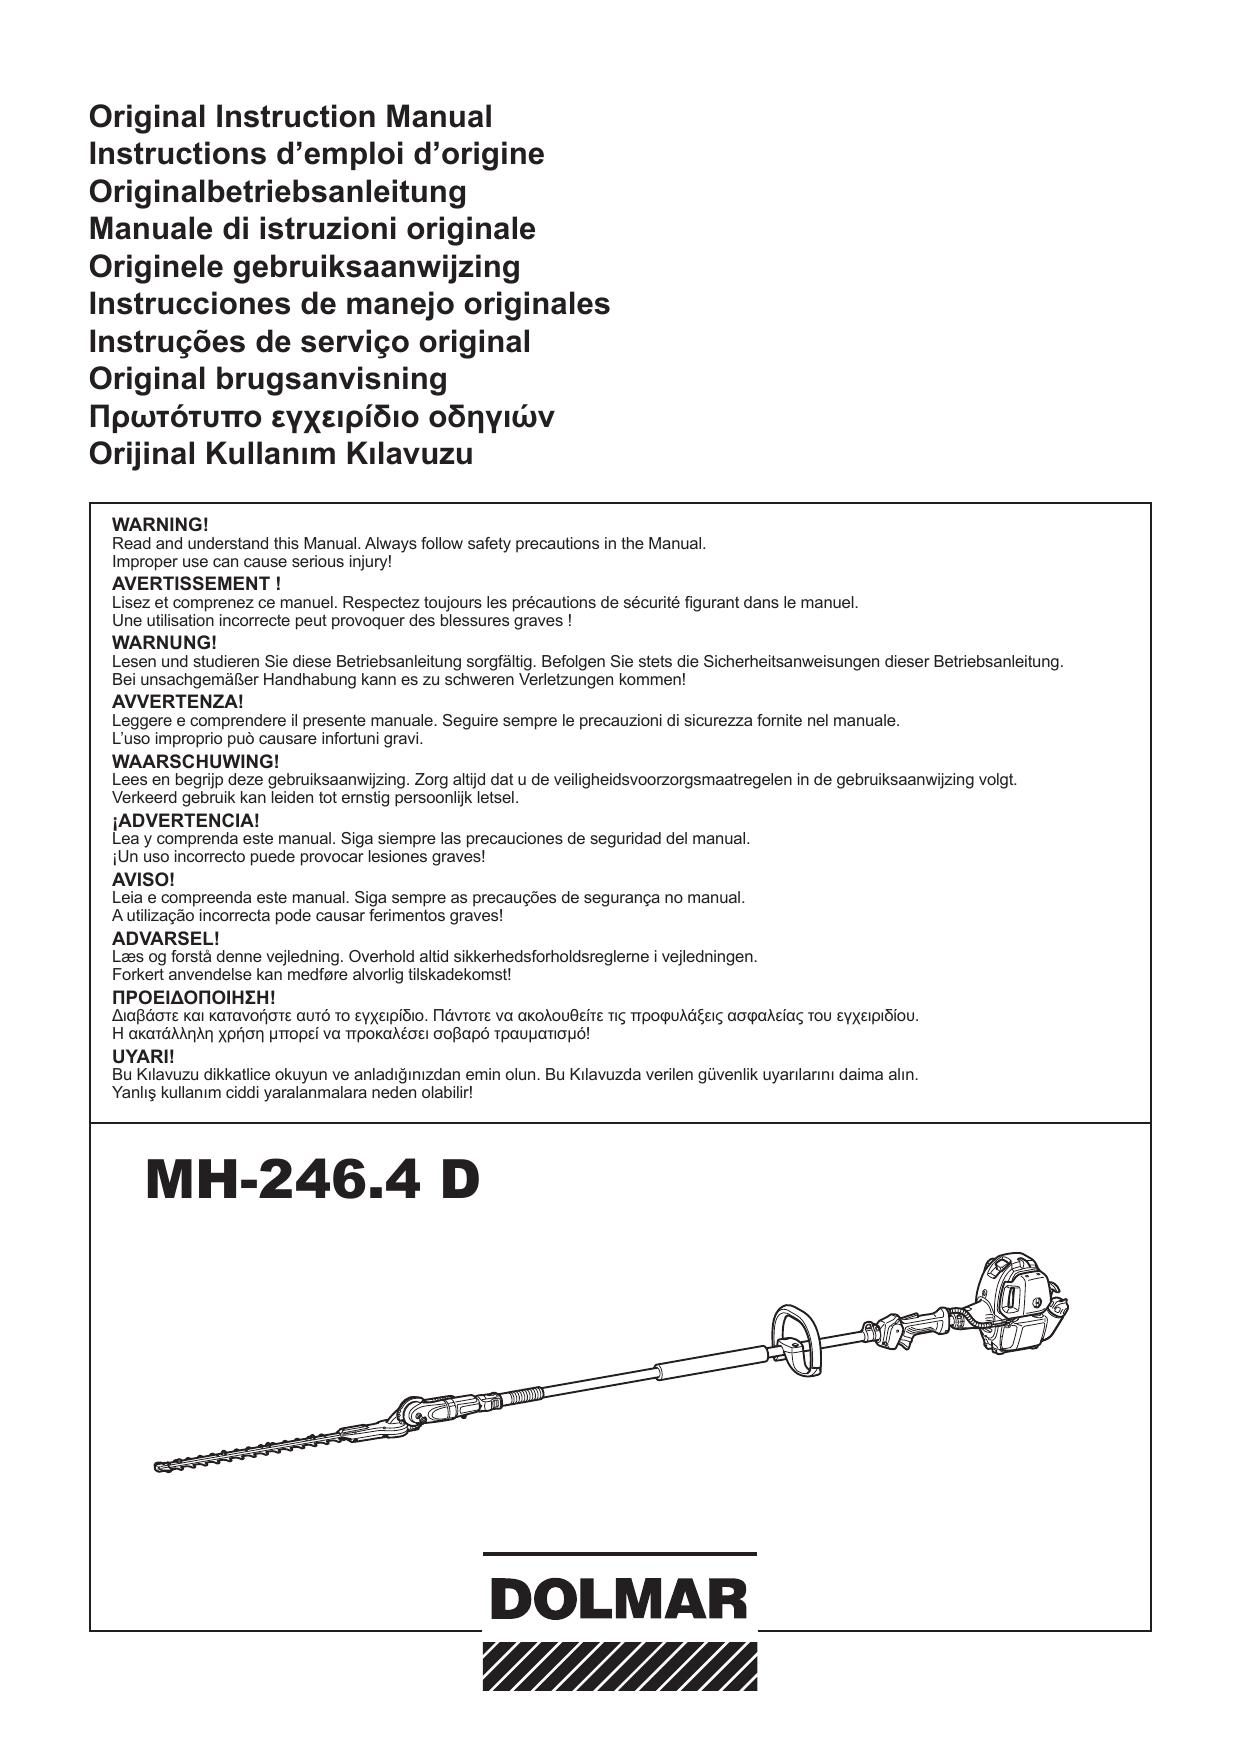 2 M starterseil Corde 3,5 mm Adapté Dolmar 100 111 105 115 112 114 117 119